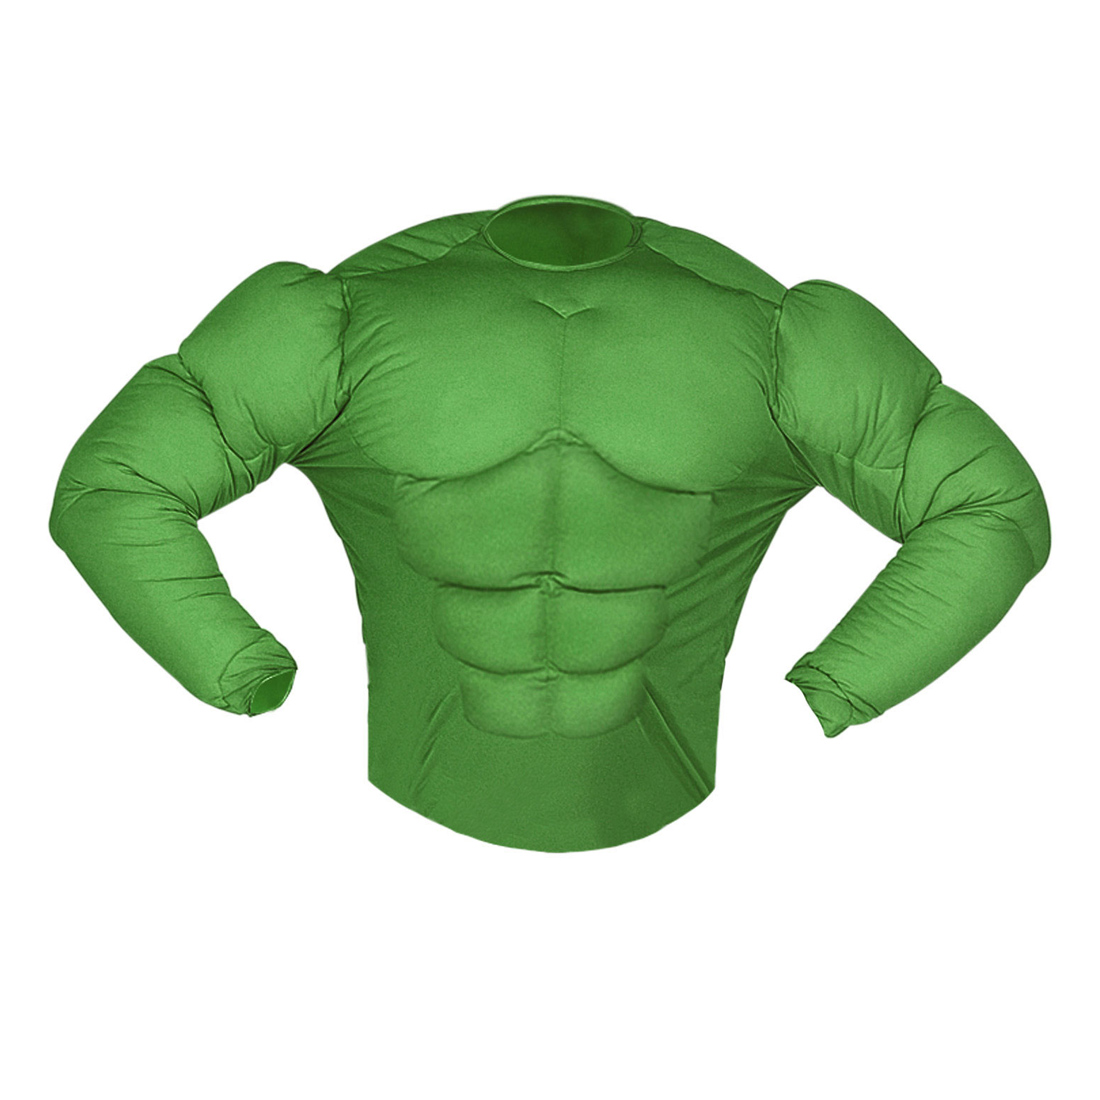 superhelden kost m hulk muskelkost m muskel shirt superheldenkost m gr n sixpack ebay. Black Bedroom Furniture Sets. Home Design Ideas